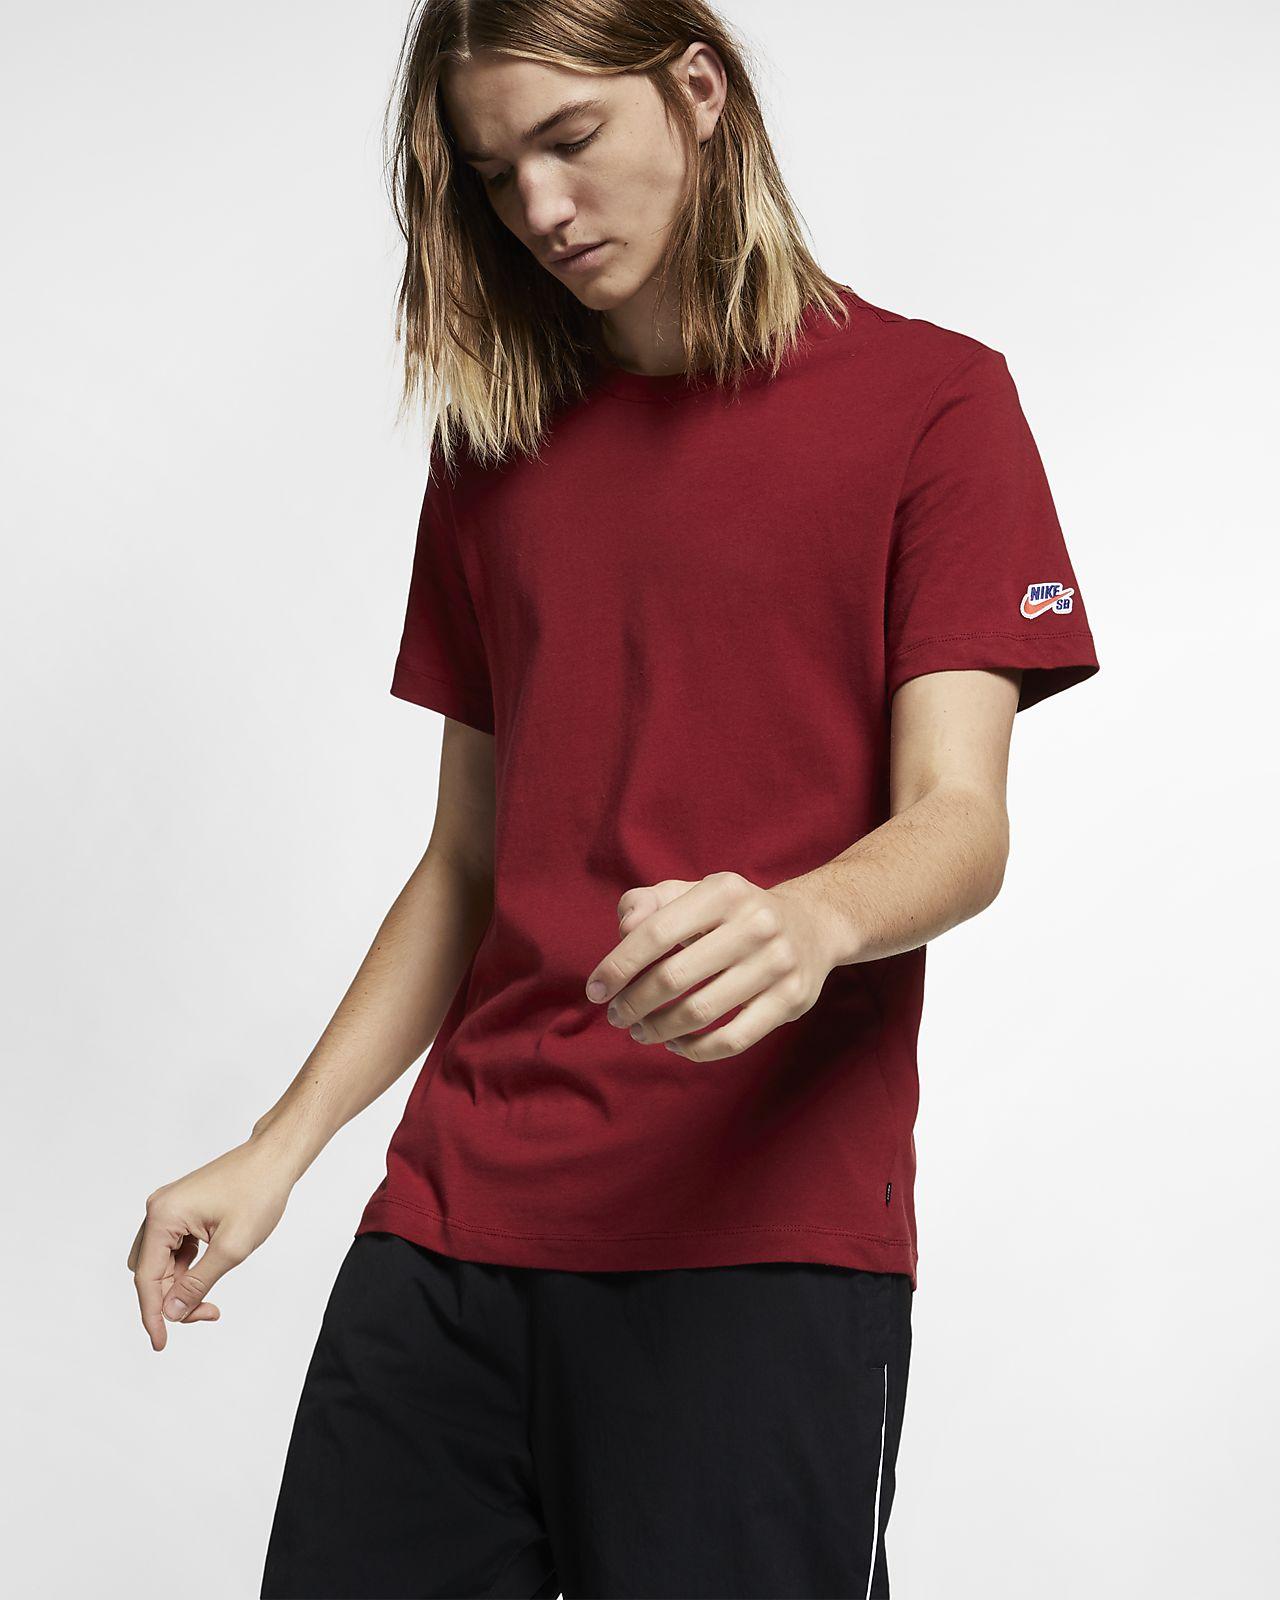 32930ae29 Nike SB Men's Skate T-Shirt. Nike.com MA